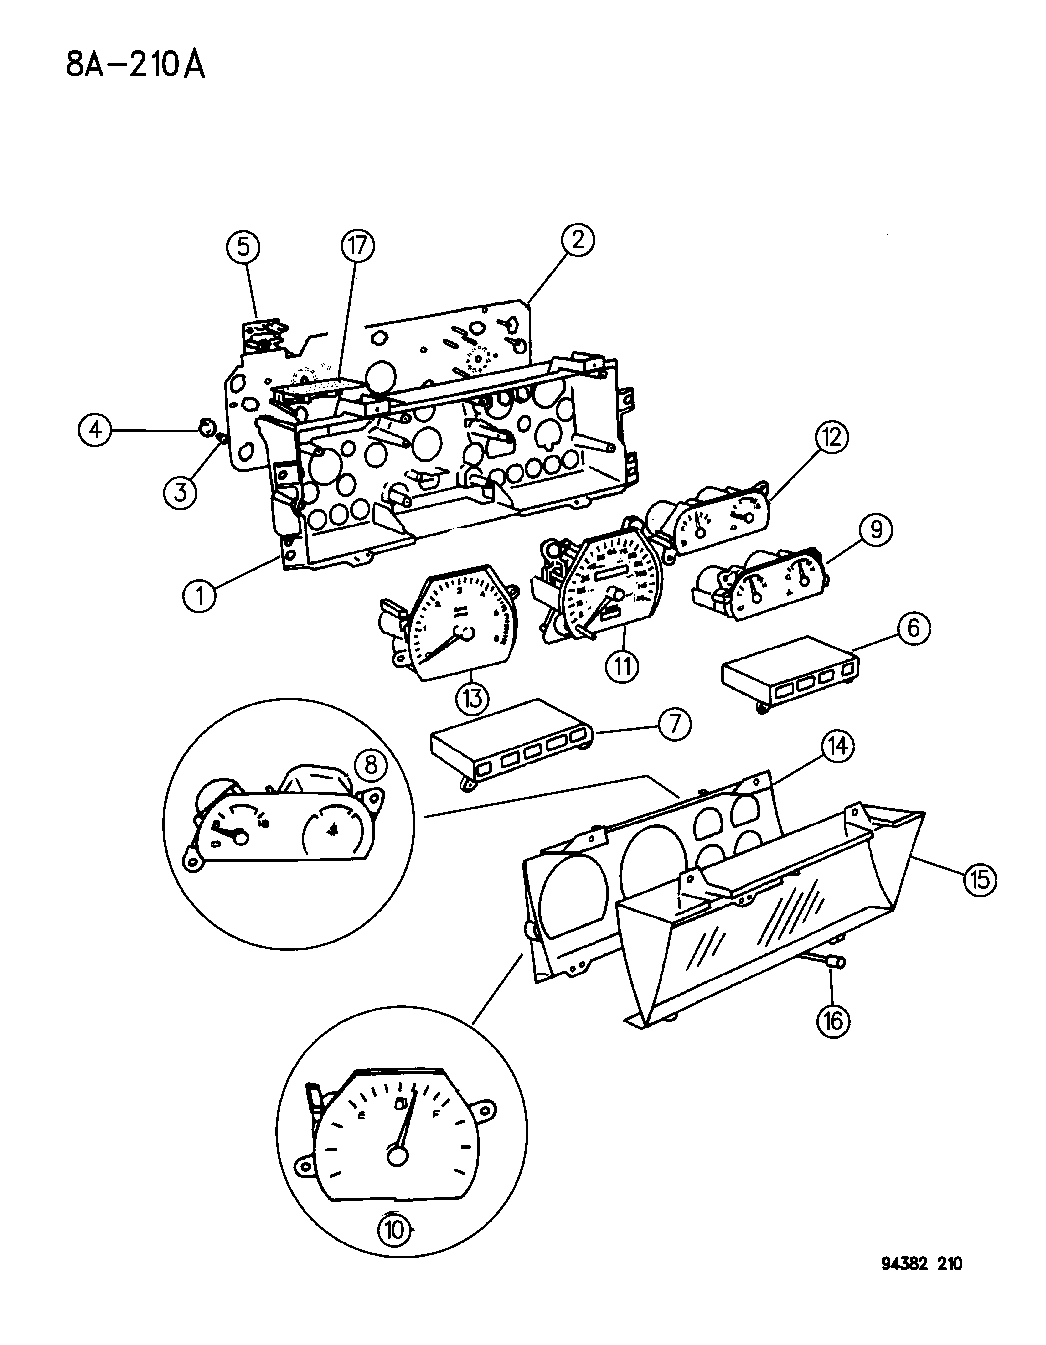 Wiring Diagram For 1995 Dodge Ram 2500 Instrument Cluster